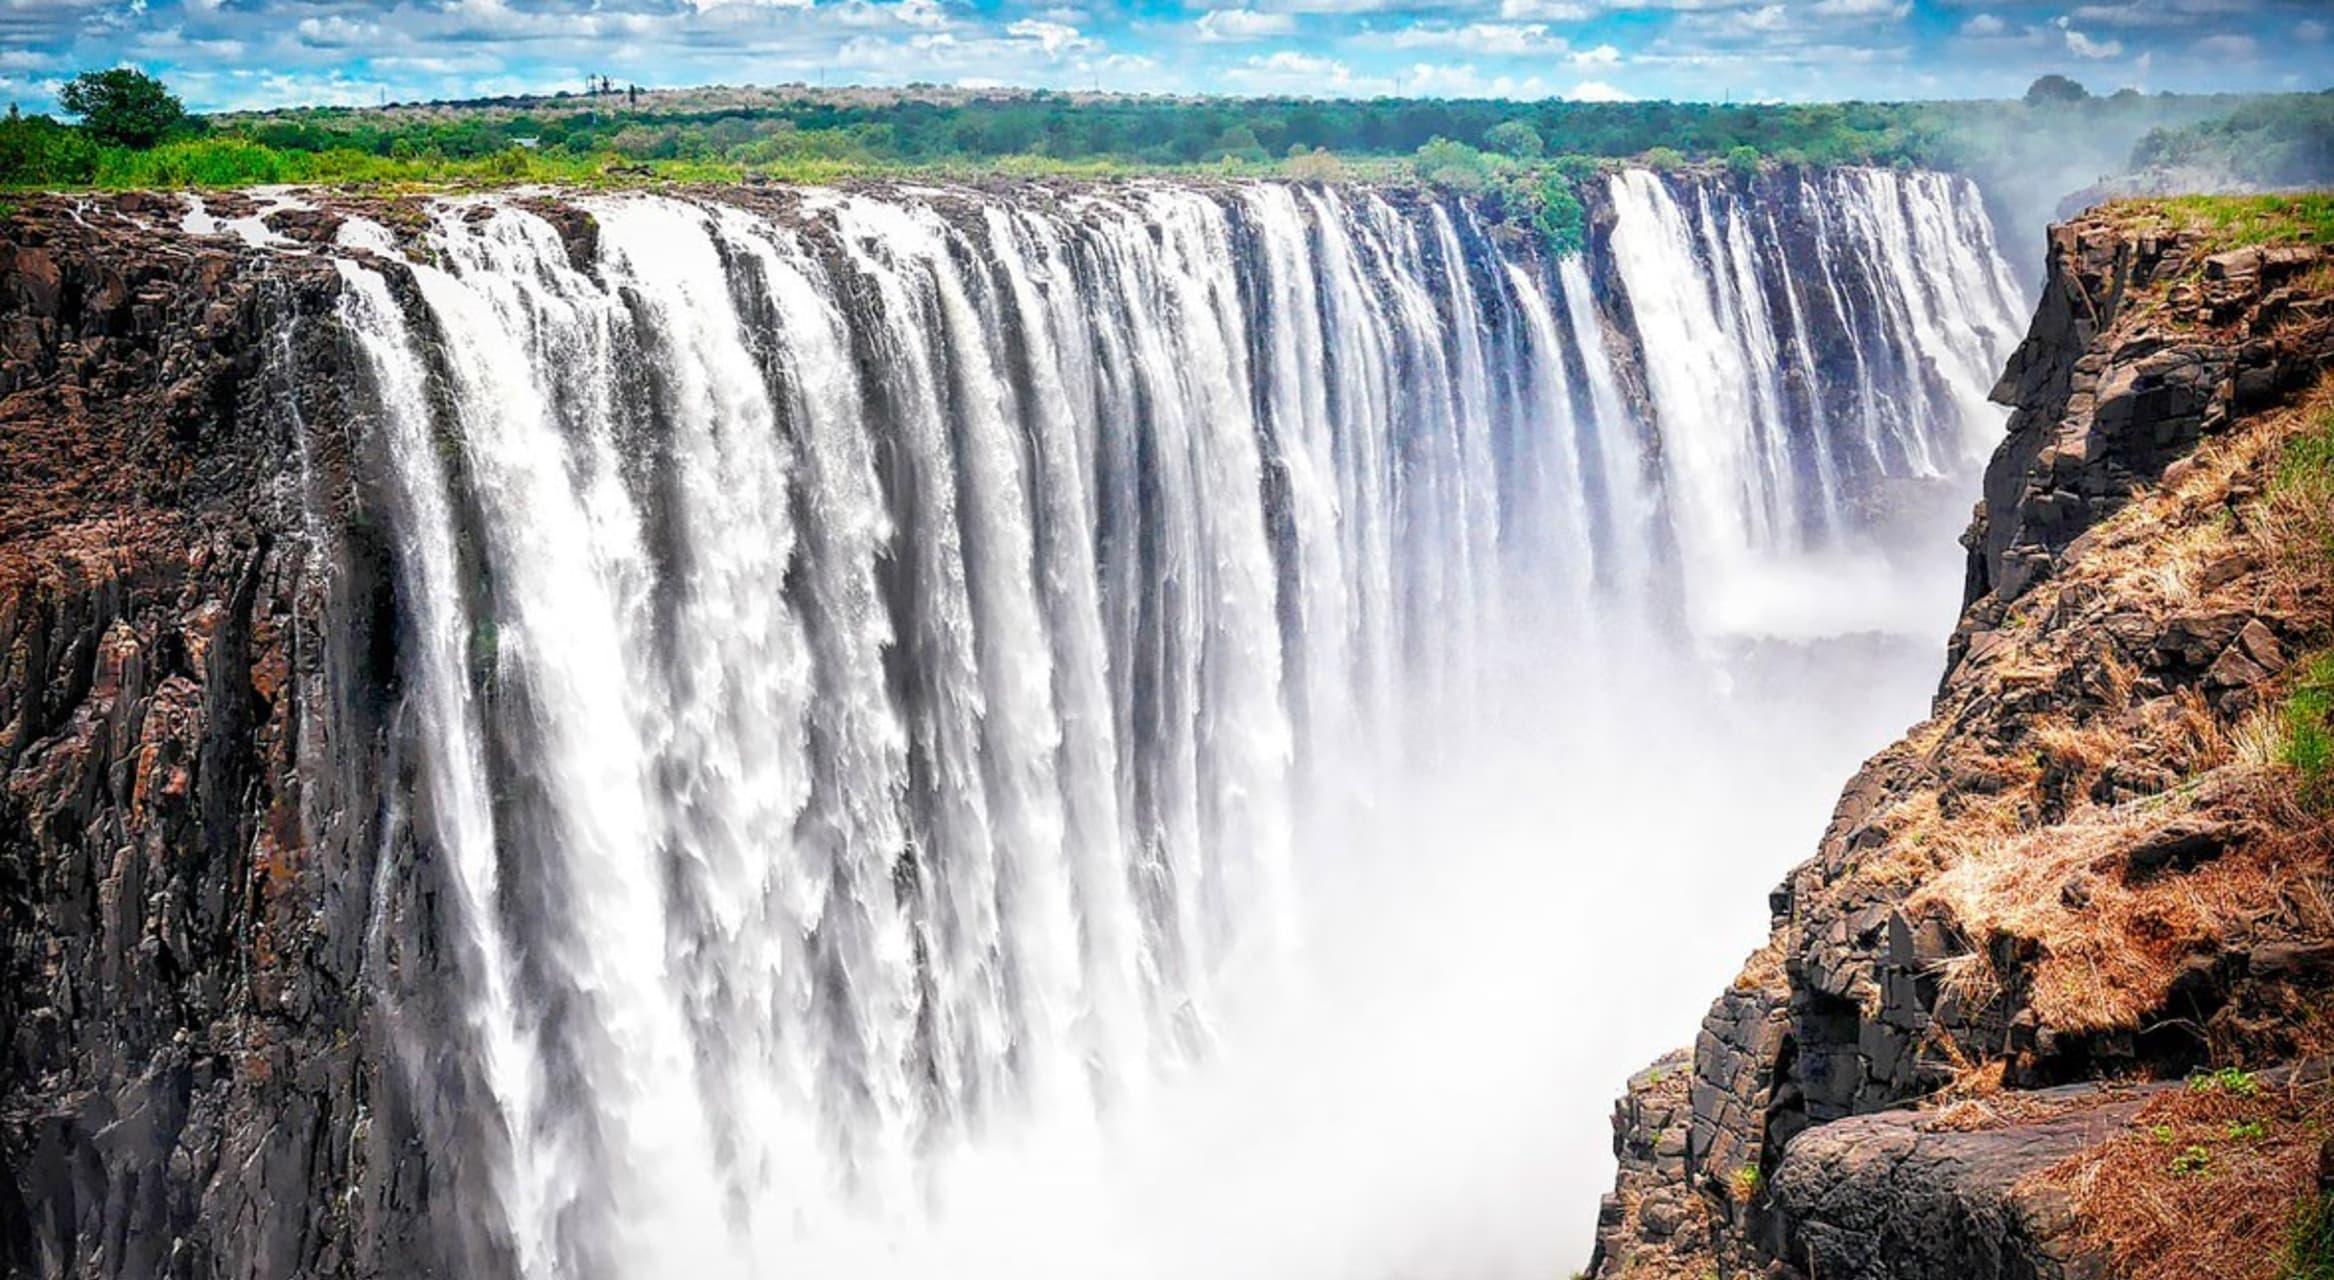 Victoria Falls - The Mighty Victoria Falls